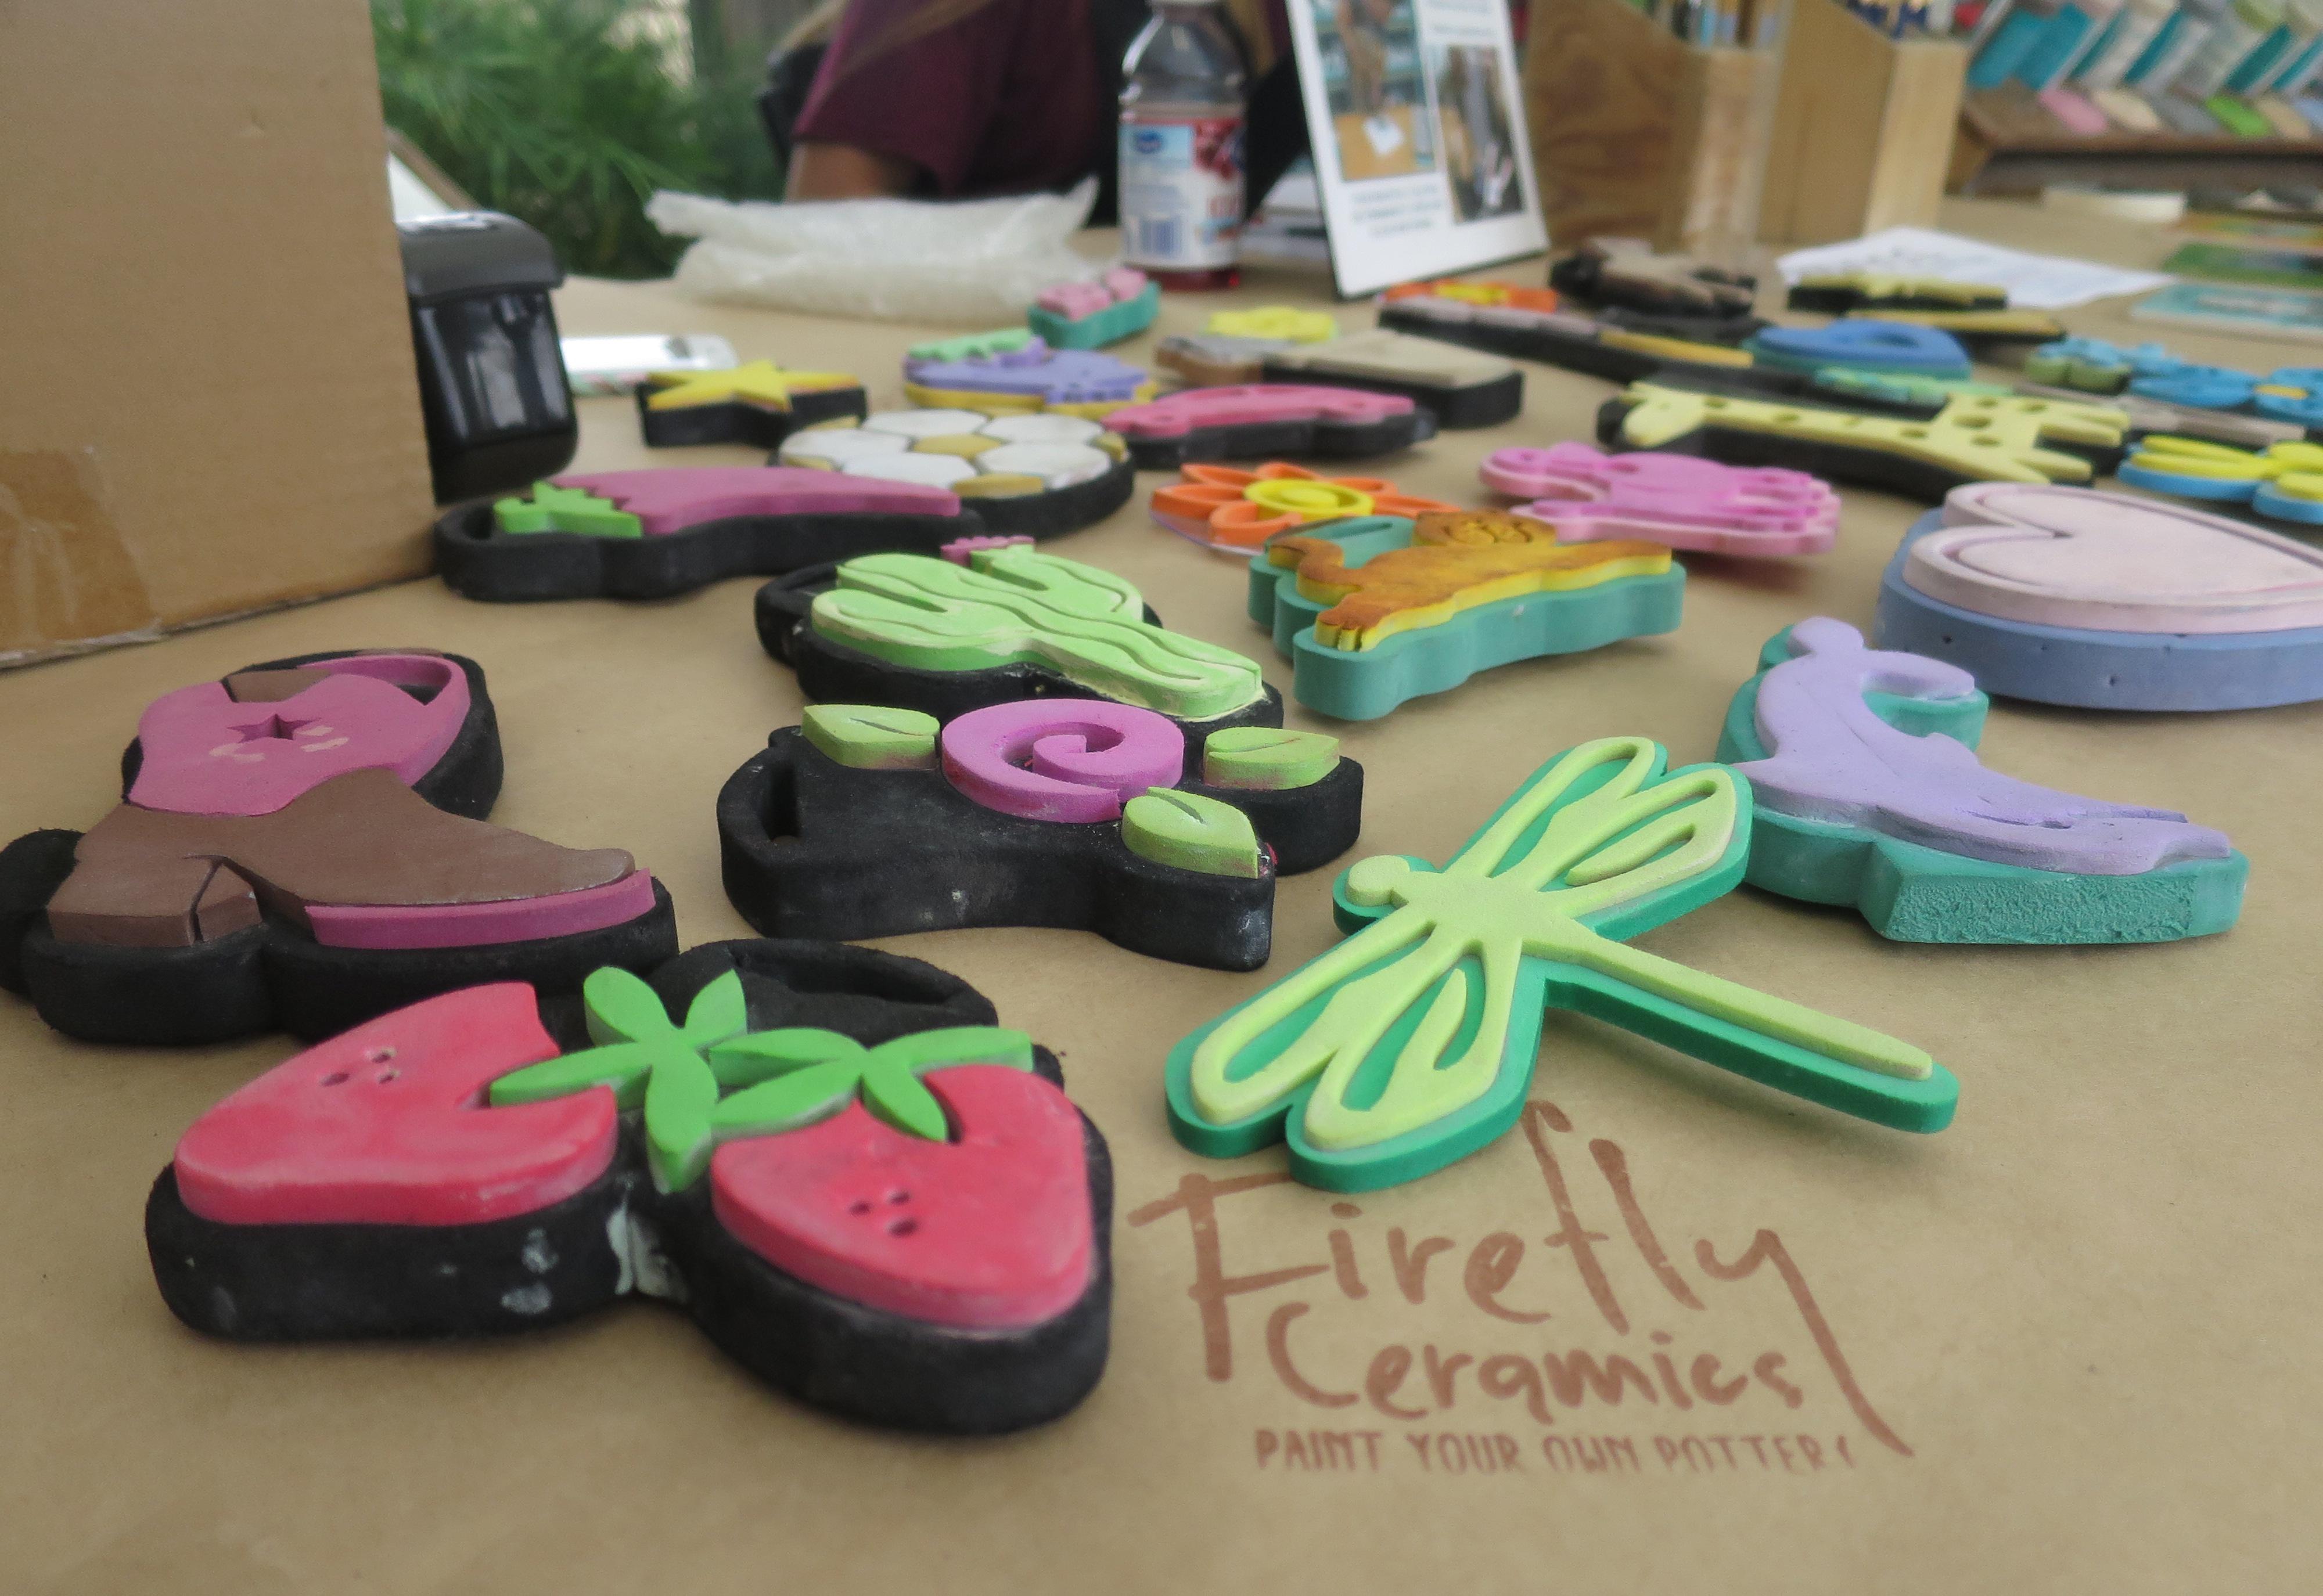 firefly.3.jpg